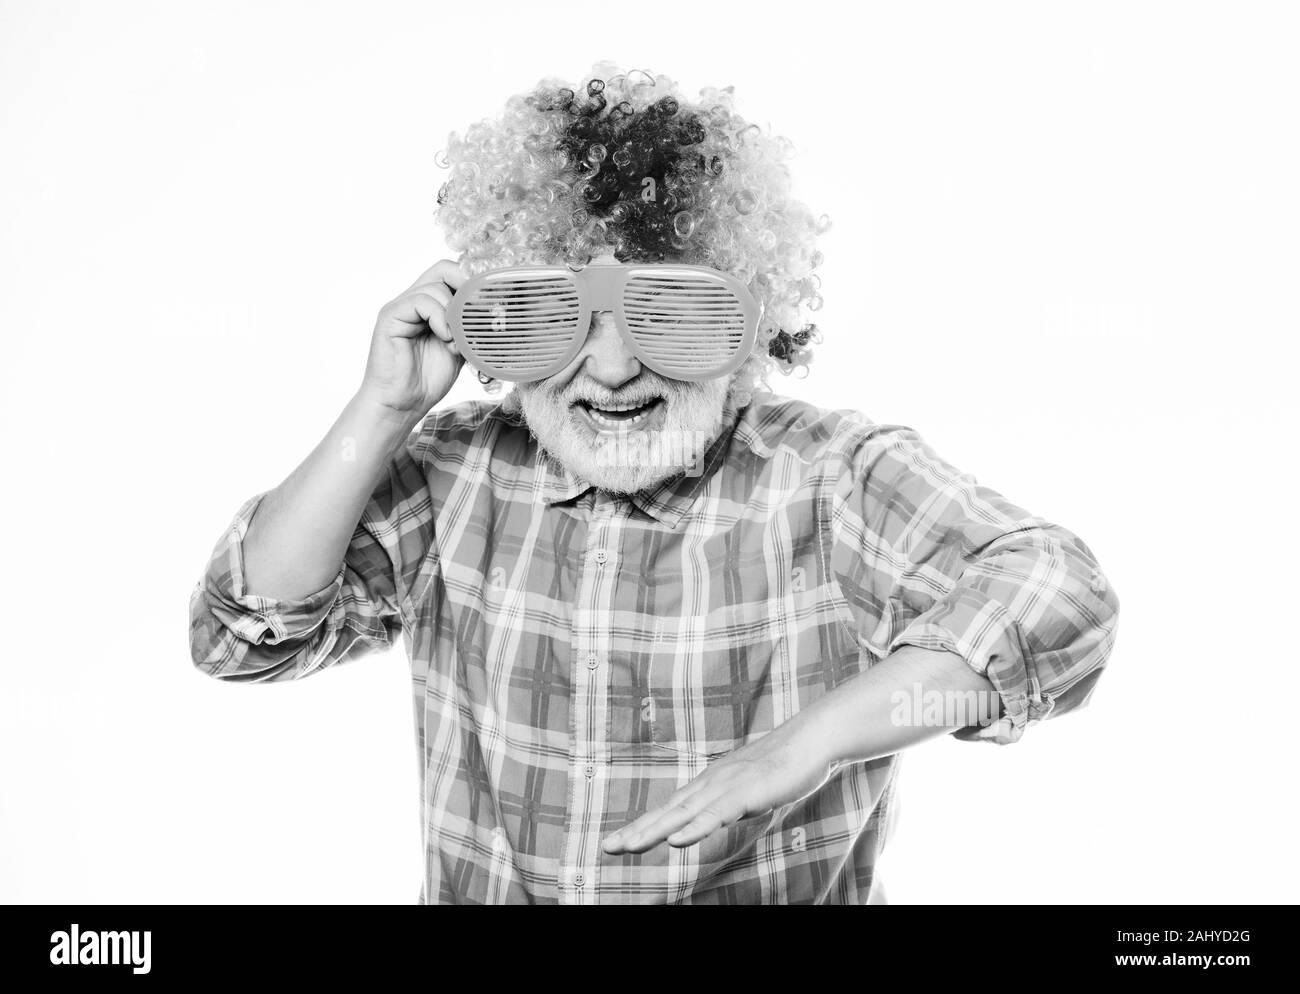 Nice joke. Grandpa always fun. Elderly clown. Man senior bearded cheerful person wear colorful wig and sunglasses. Having fun. Funny lifestyle. Fun and entertainment. Comic grandfather concept. Stock Photo